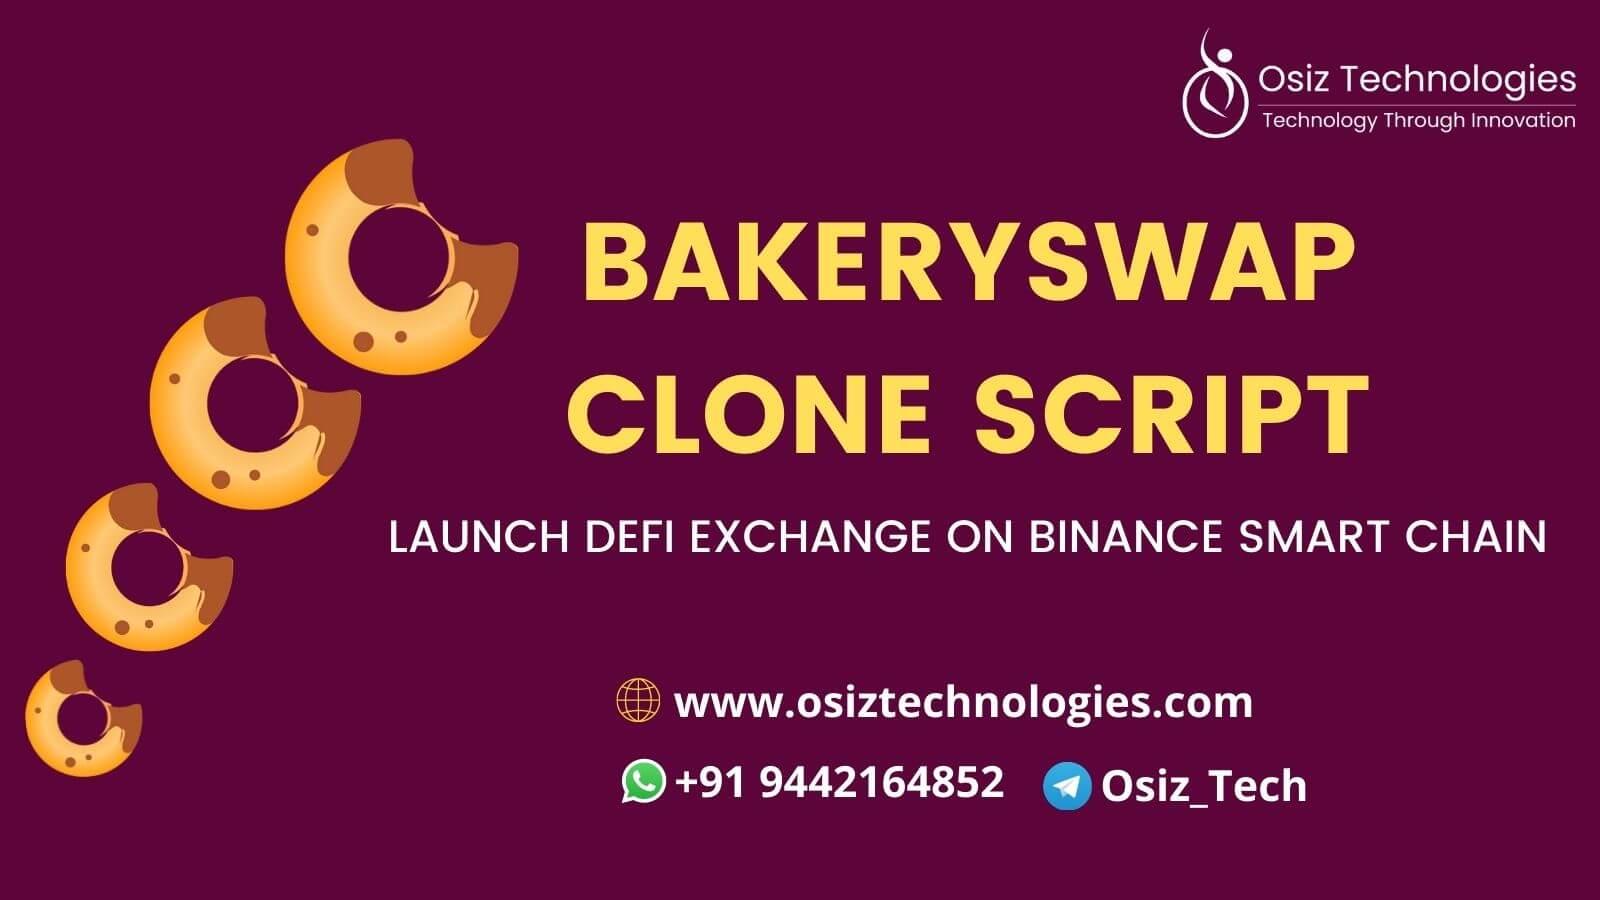 BakerySwap Clone Script - Start DeFi Exchange Platform on Binance Smart Chain